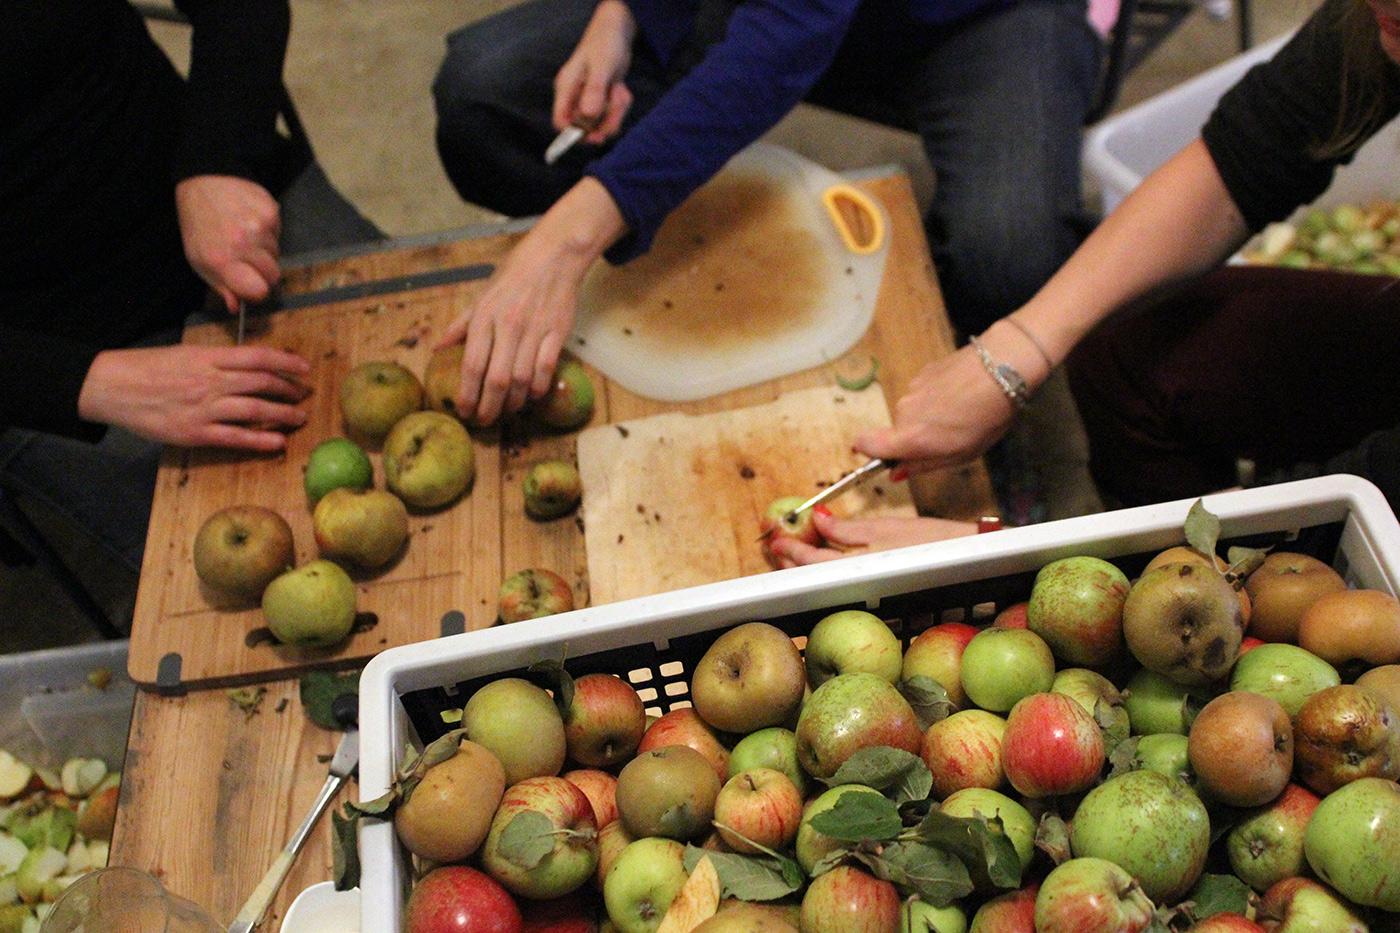 cider-maken-appels-snijden-2